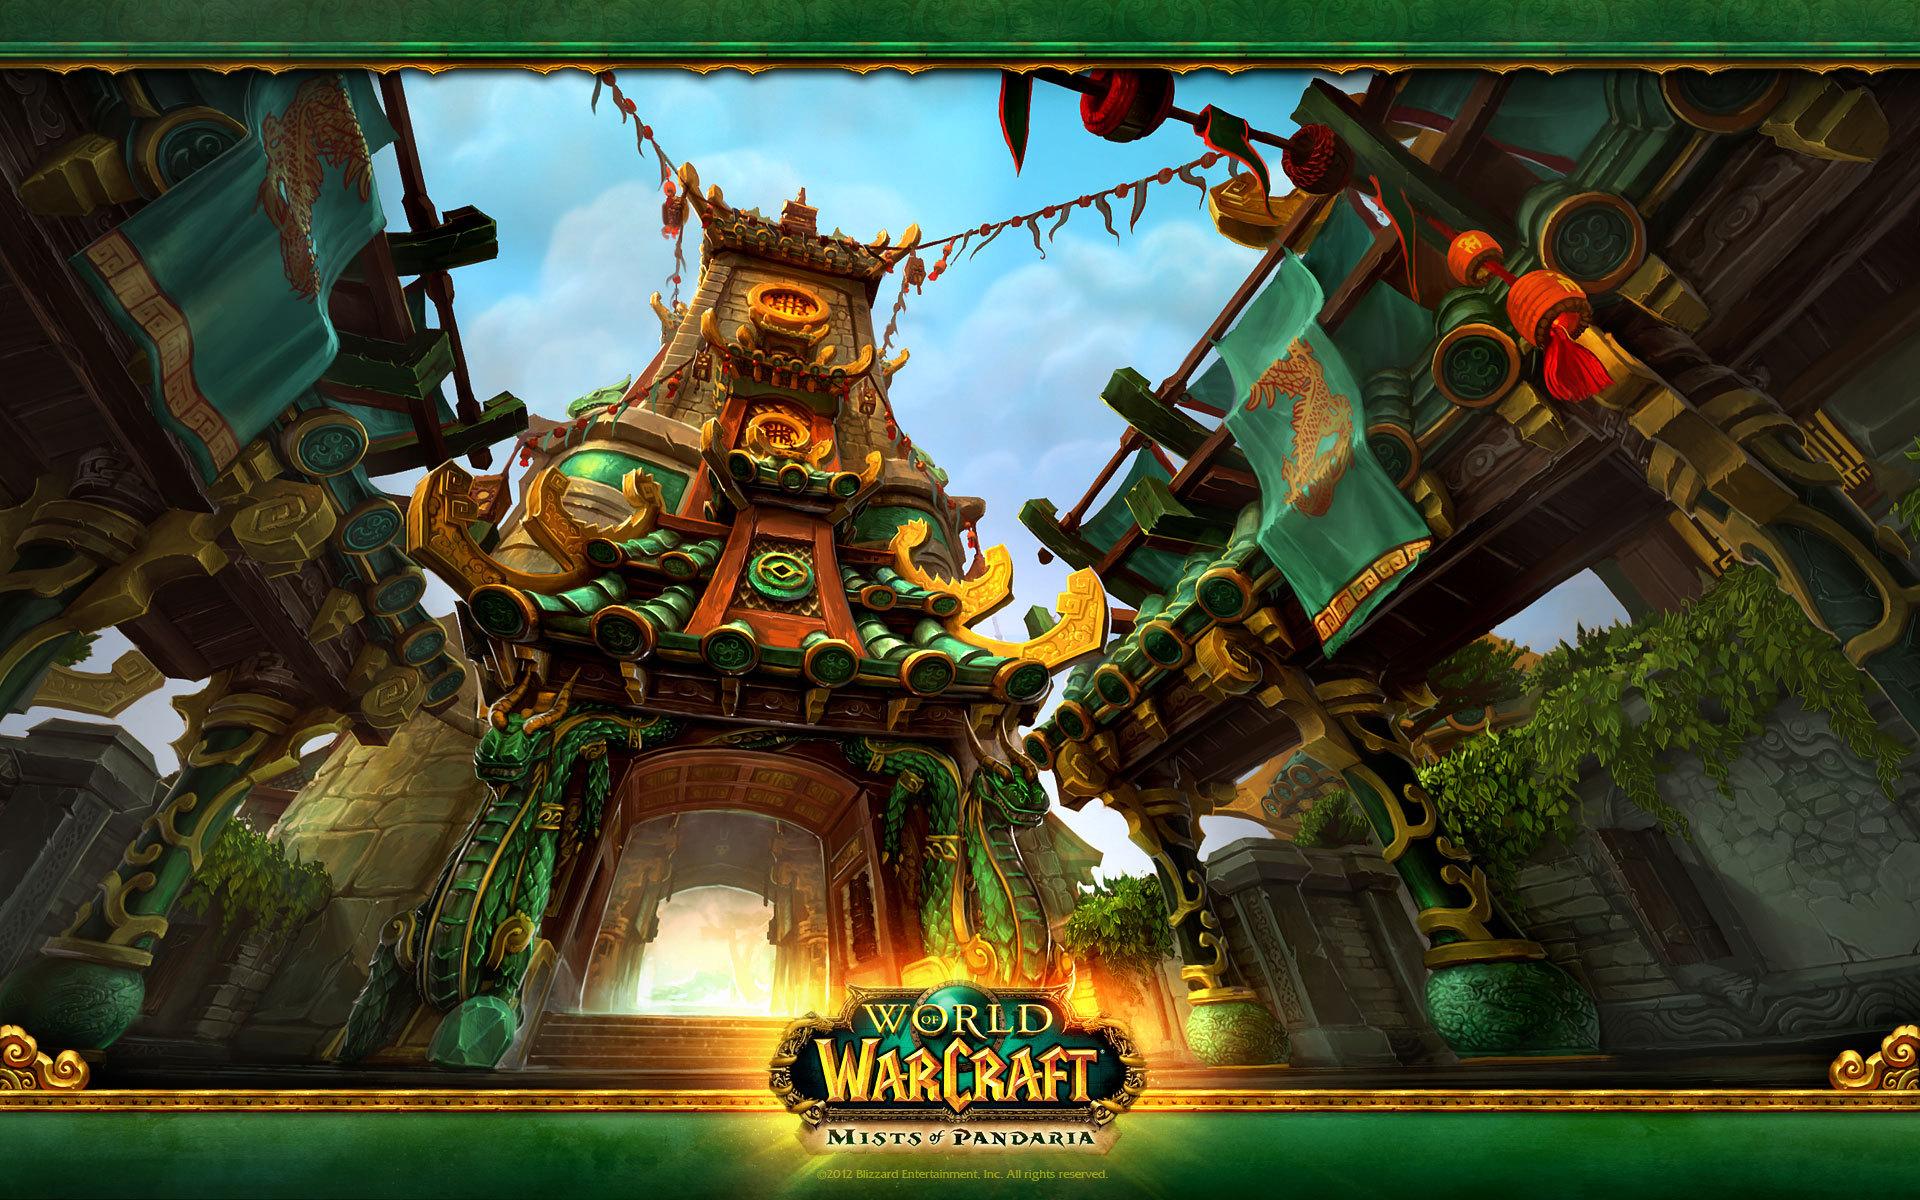 Wallpaper wow panda world of warcraft wallpapers games   download 1920x1200